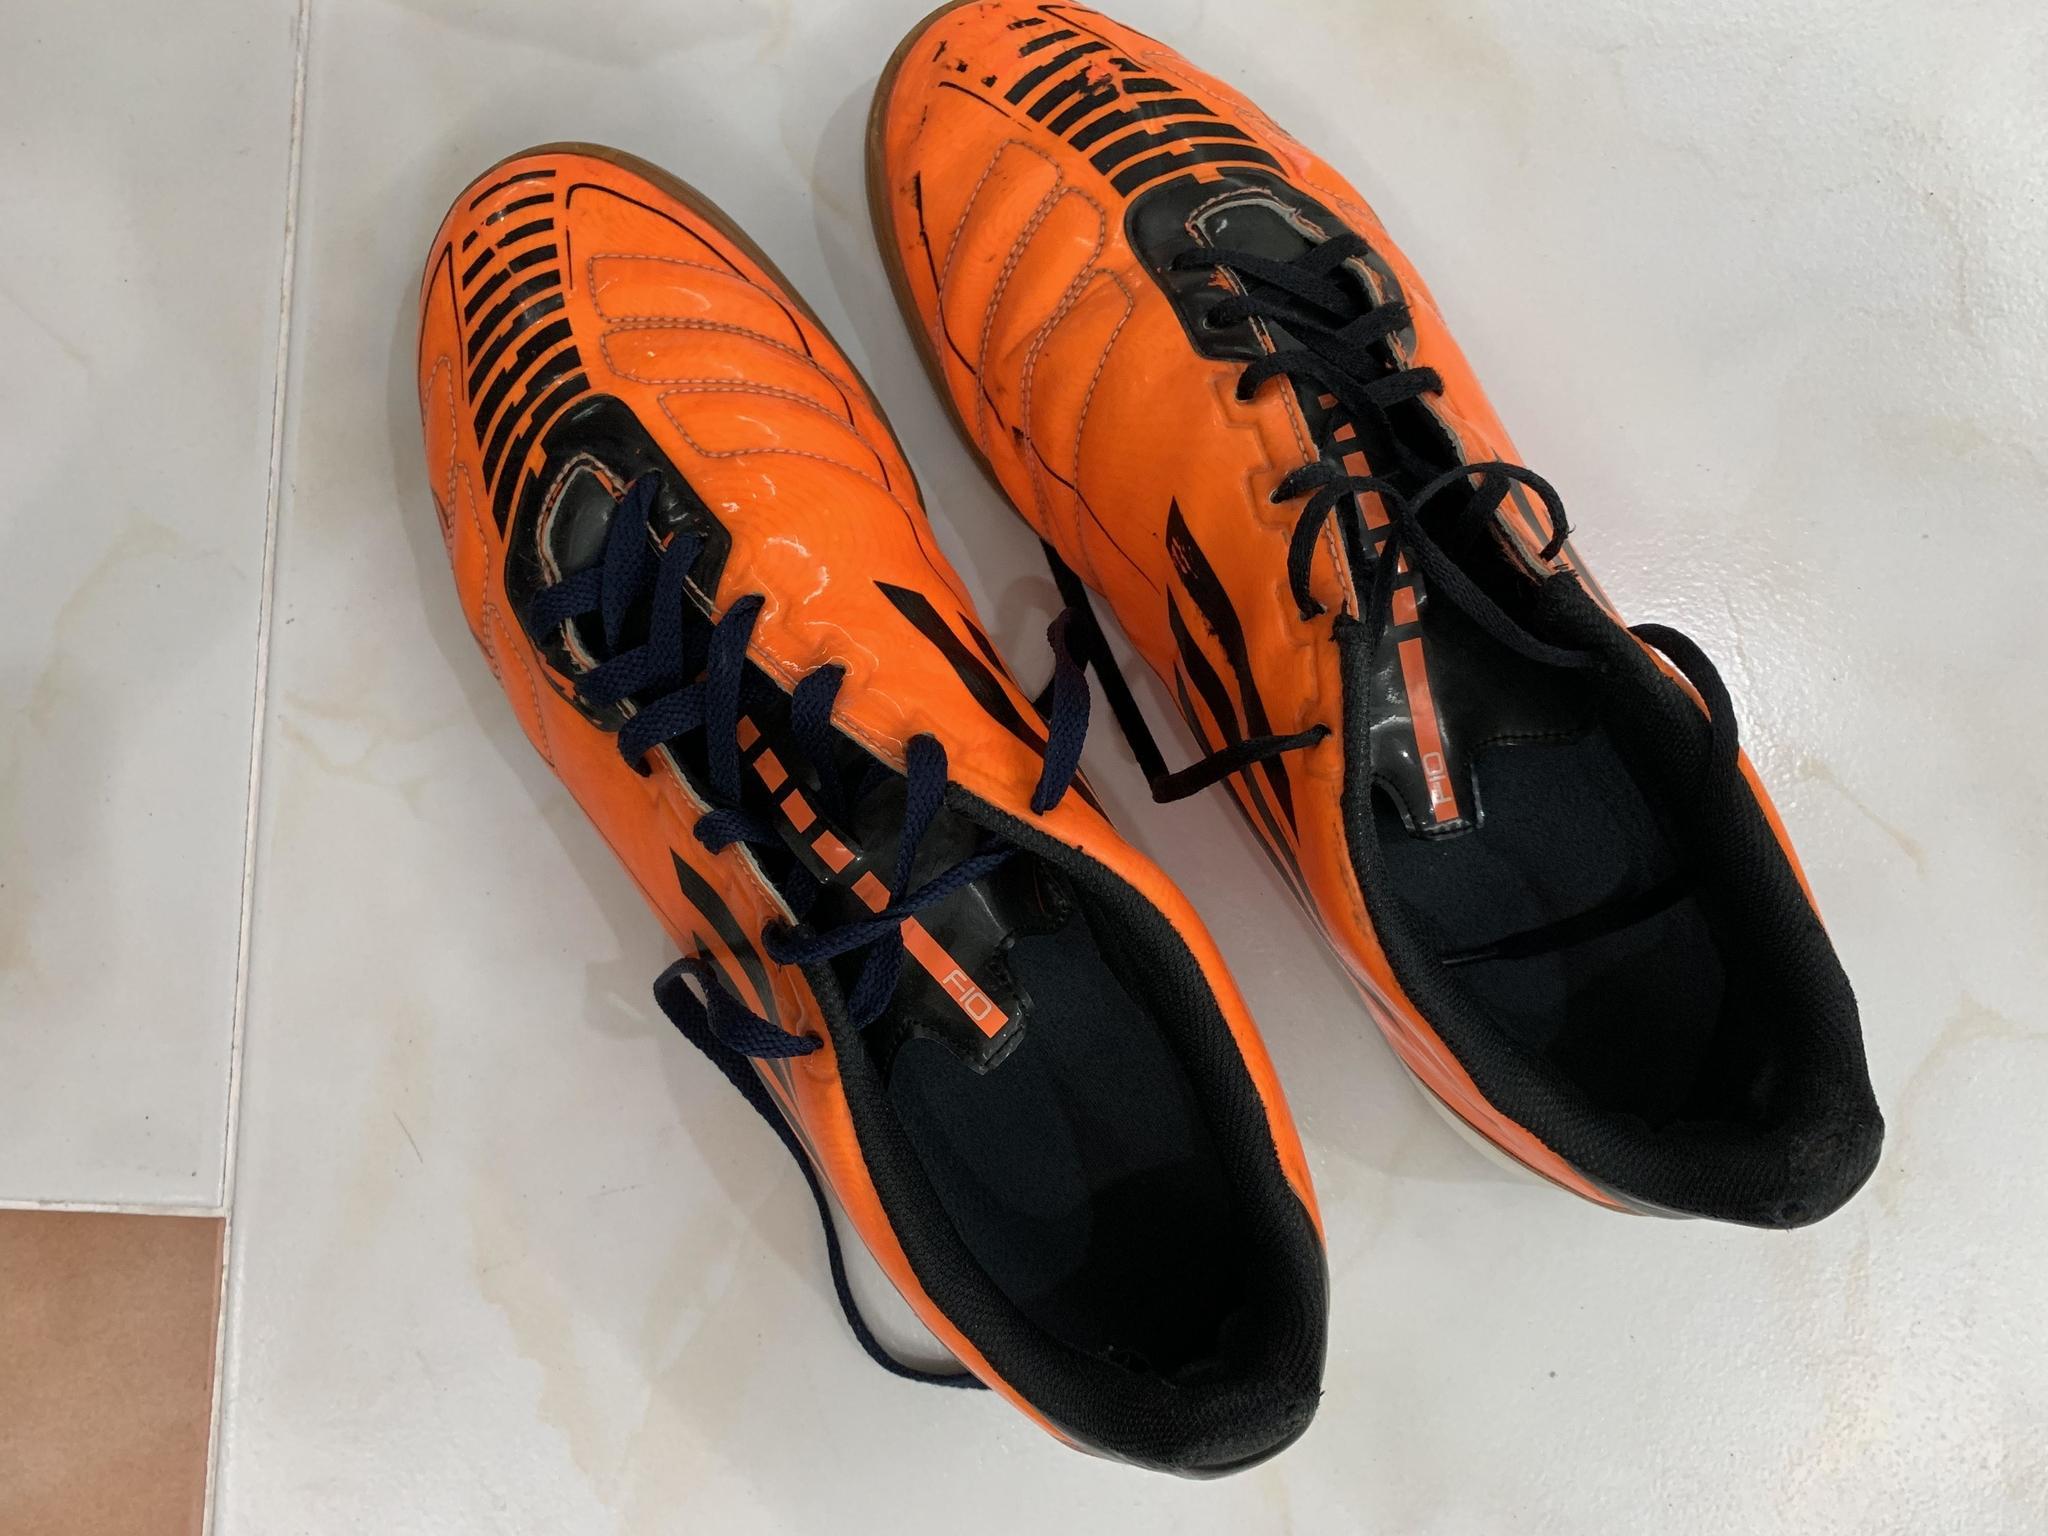 Adidas shoes f50